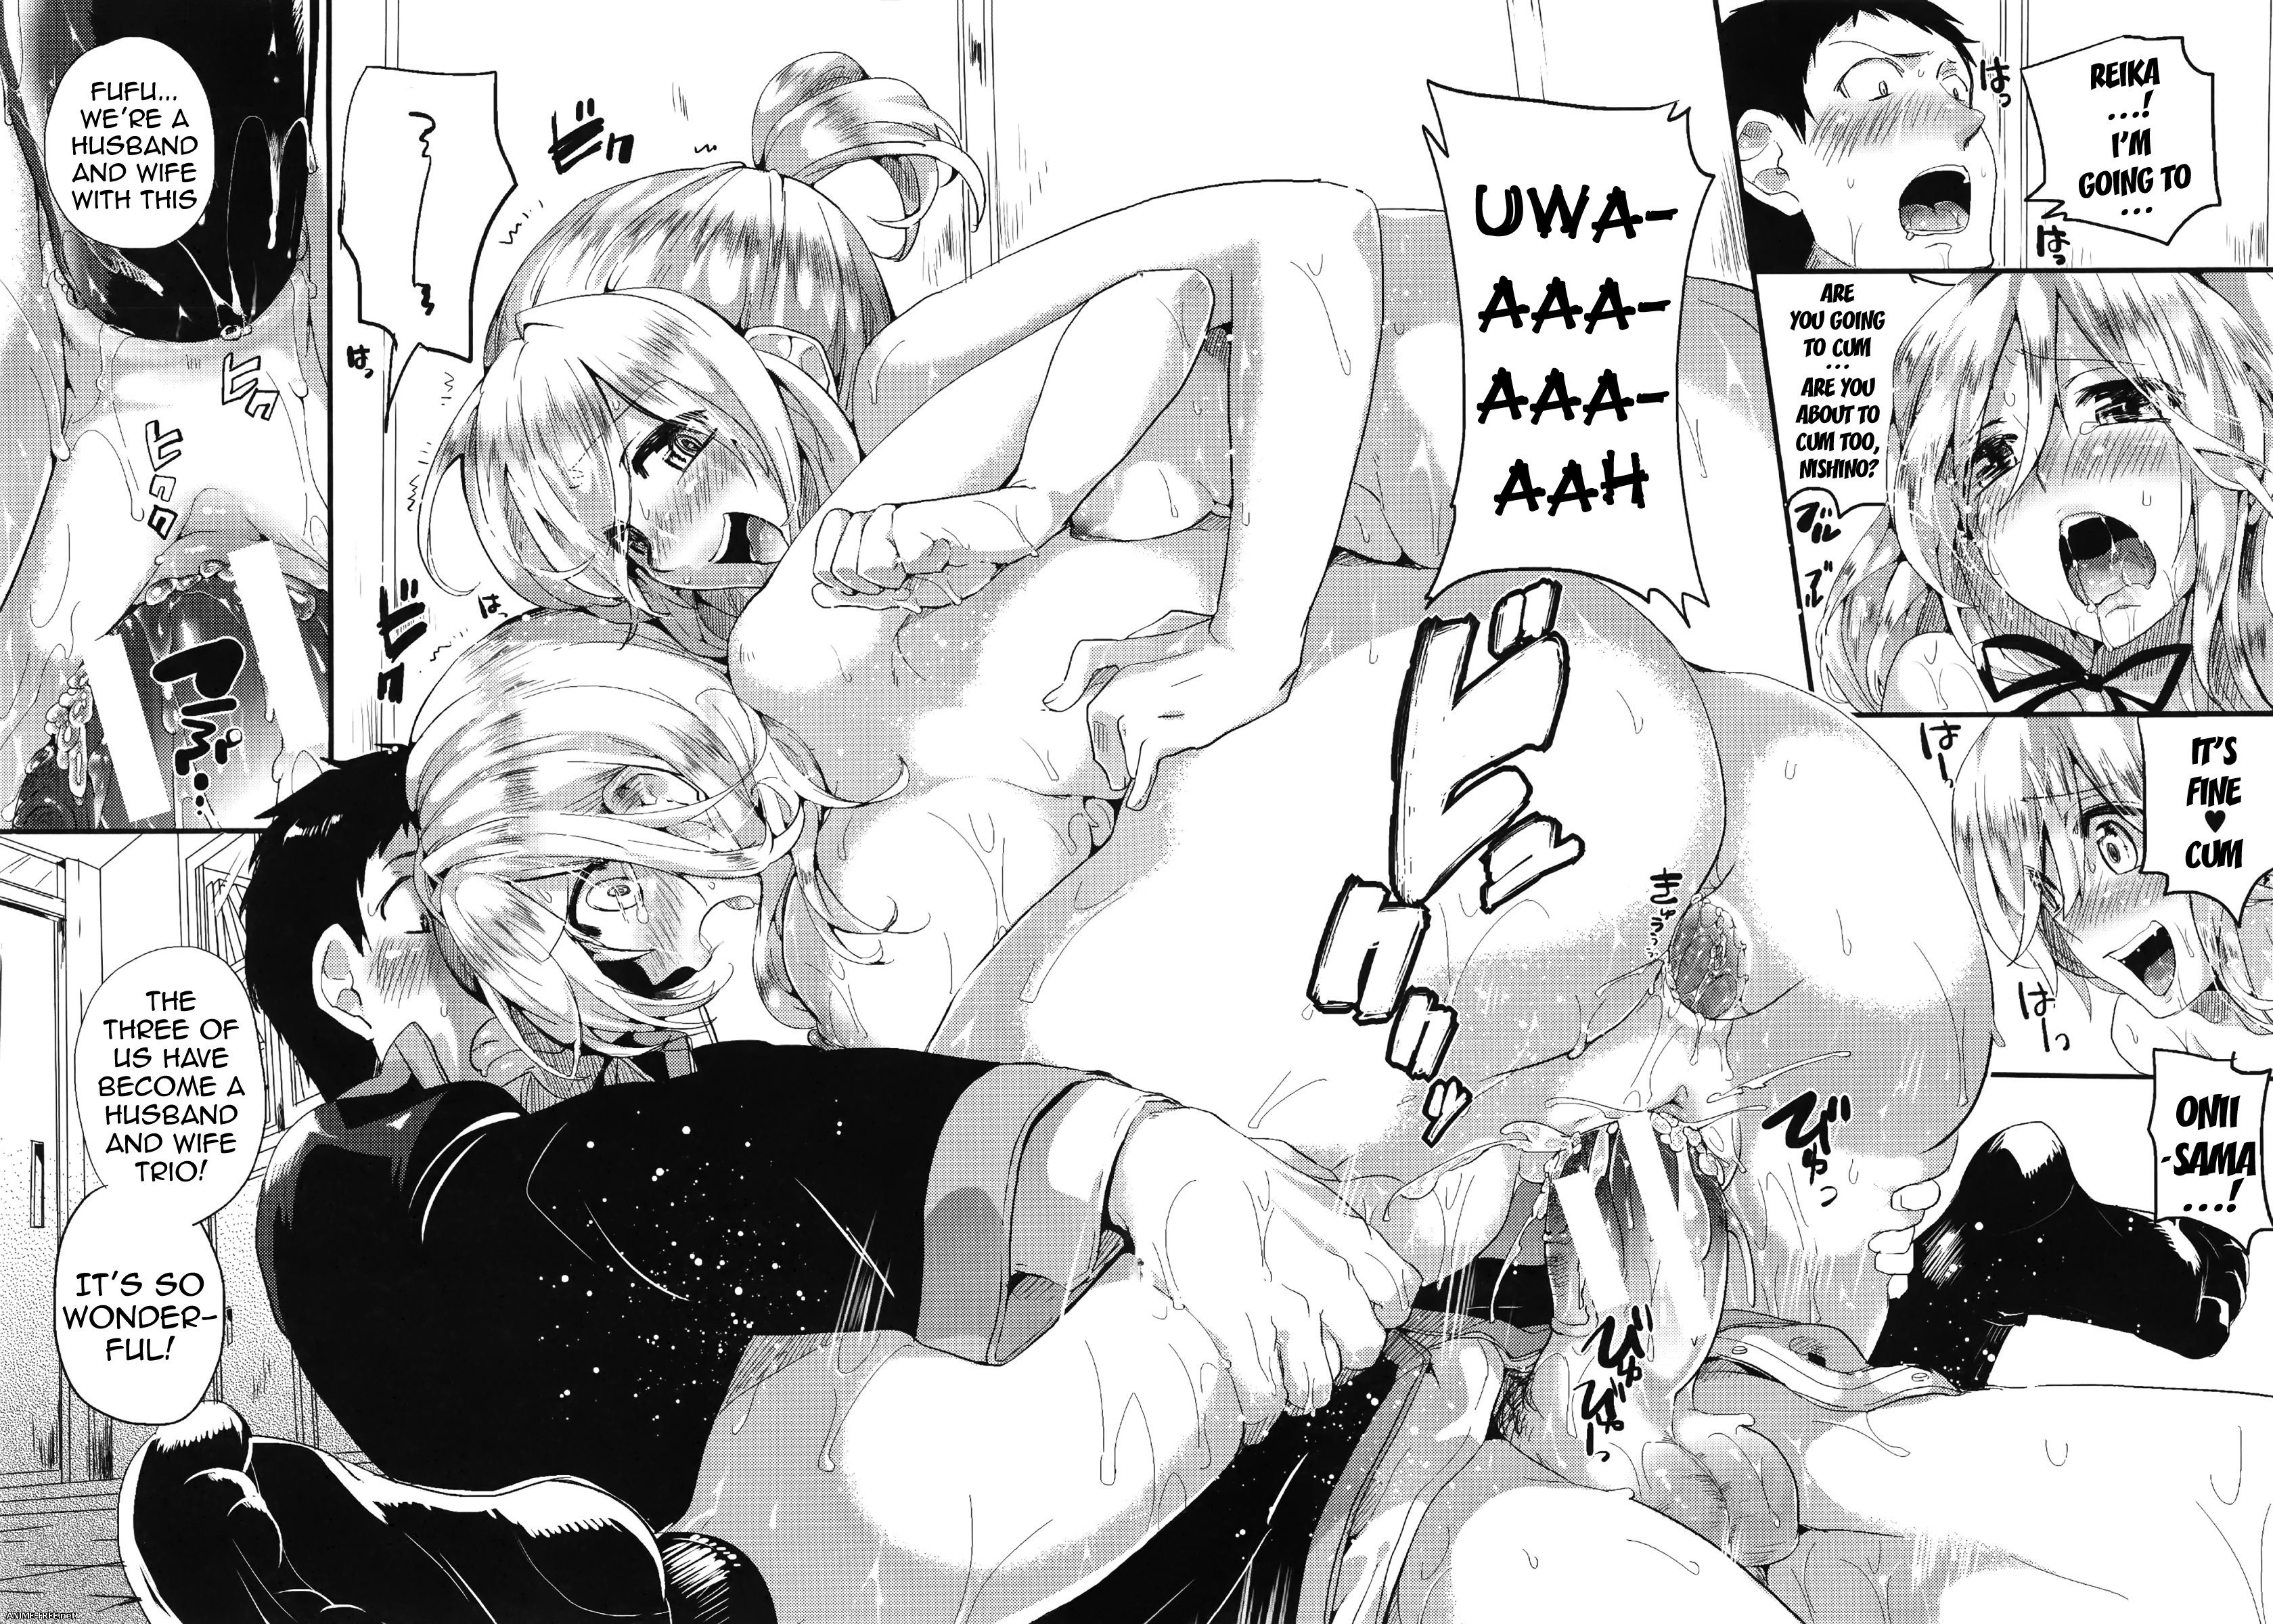 DOUMOU - (Iinari Acme Collection) | Сборник хентай манги [Ptcen] [JAP,ENG,RUS,CHI] Manga Hentai